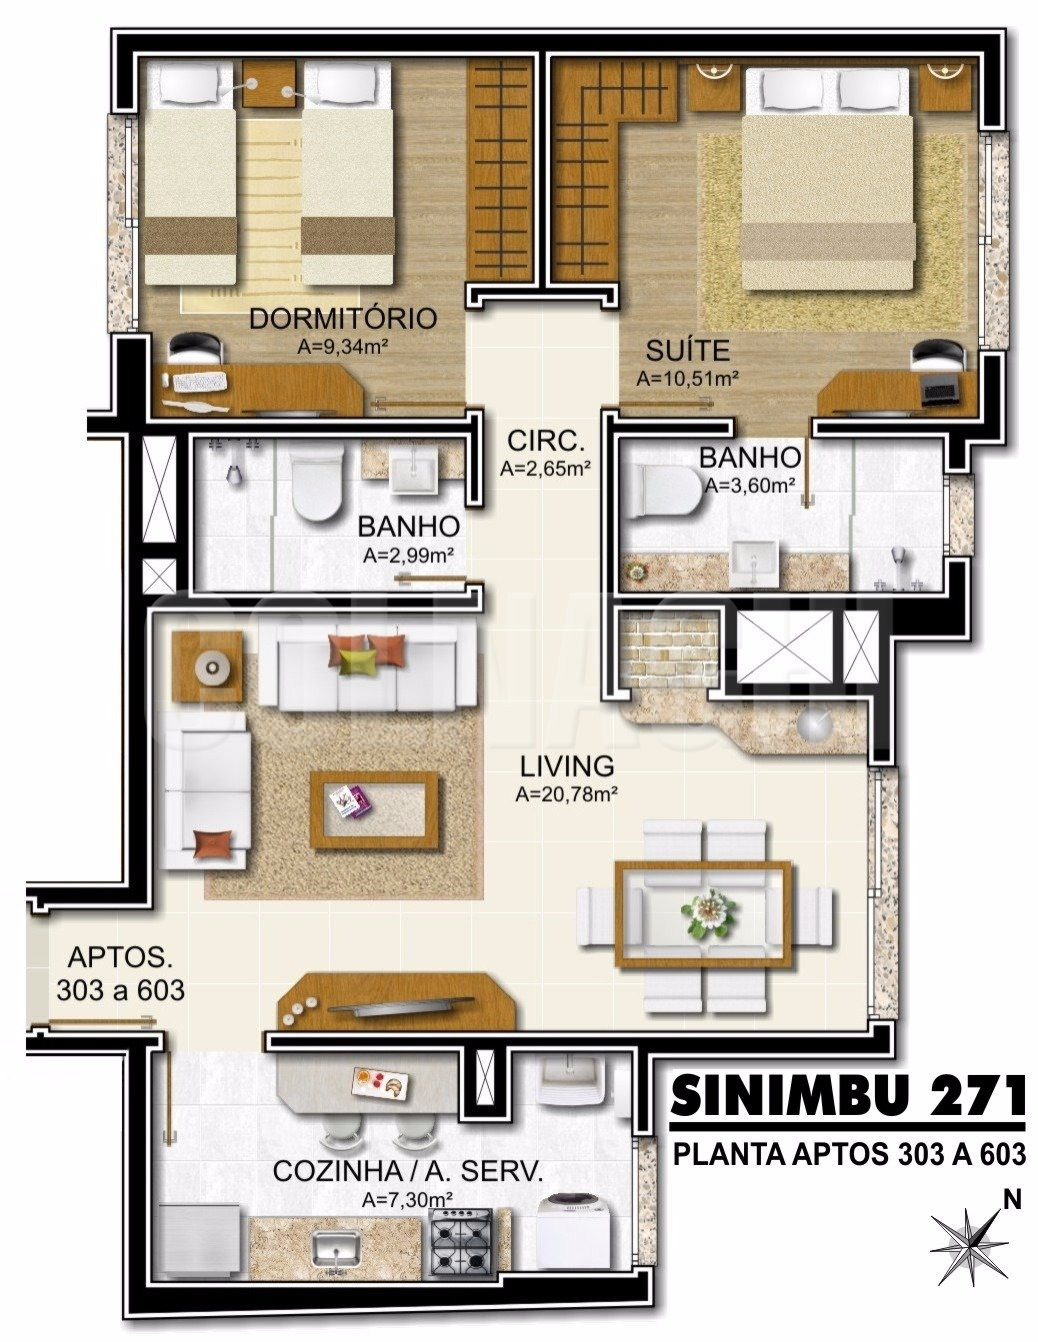 Sinimbu 271 de 2 dormitórios em Petropolis, Porto Alegre - RS